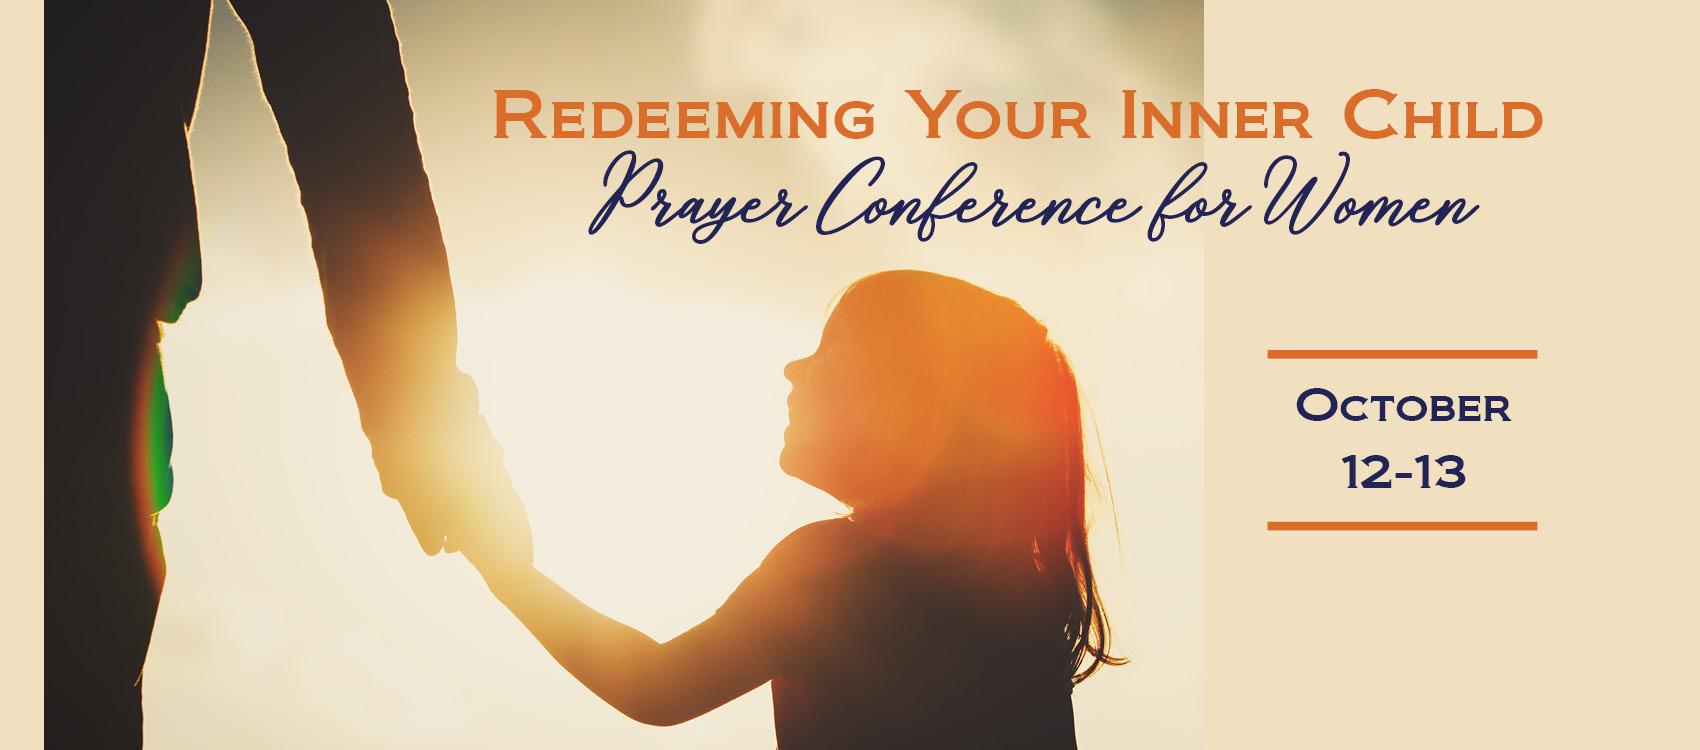 INNER HEALING PRAYER CONFERENCE